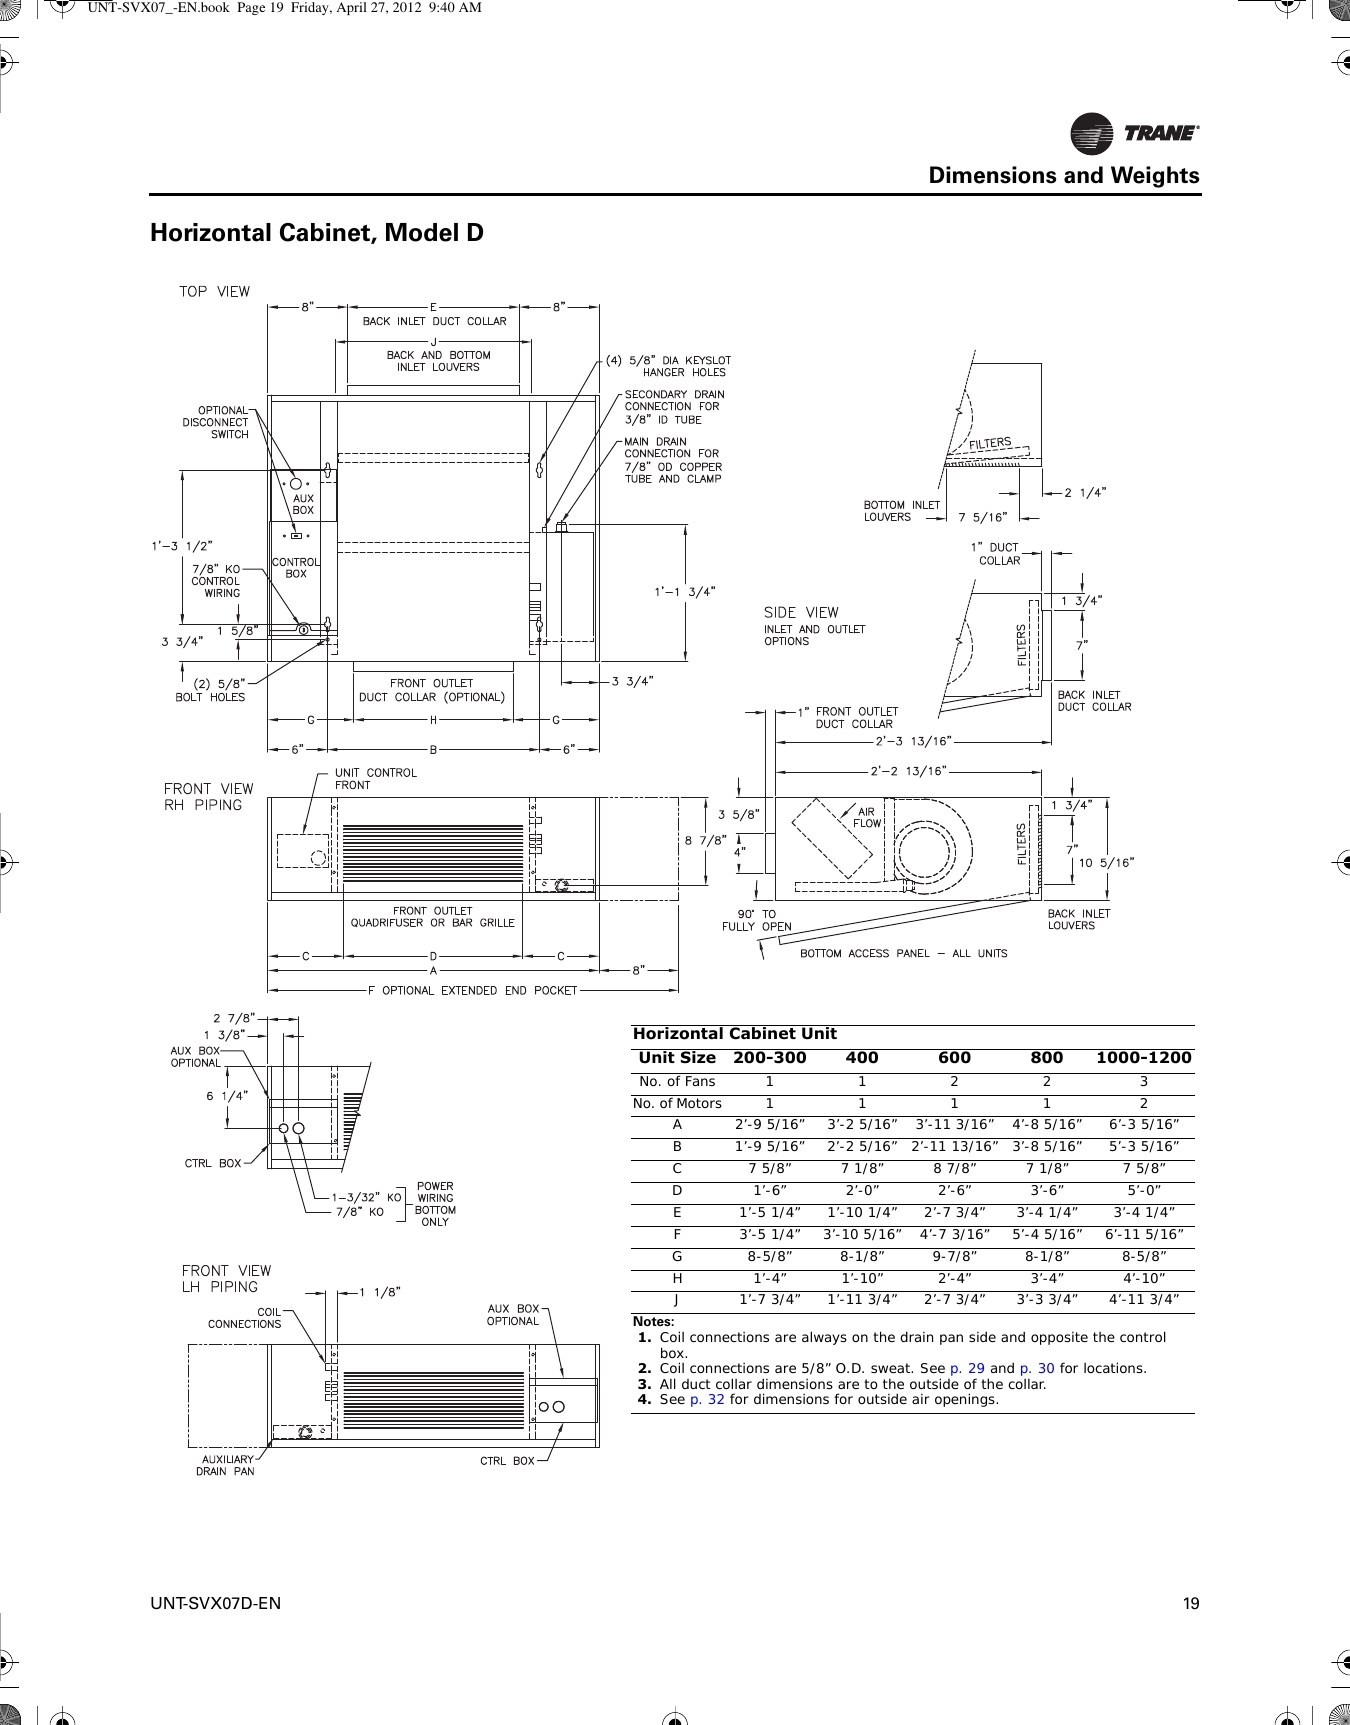 Electric Heat Wiring Diagram Standard Heat Pump Wiring Diagram Of Electric Heat Wiring Diagram